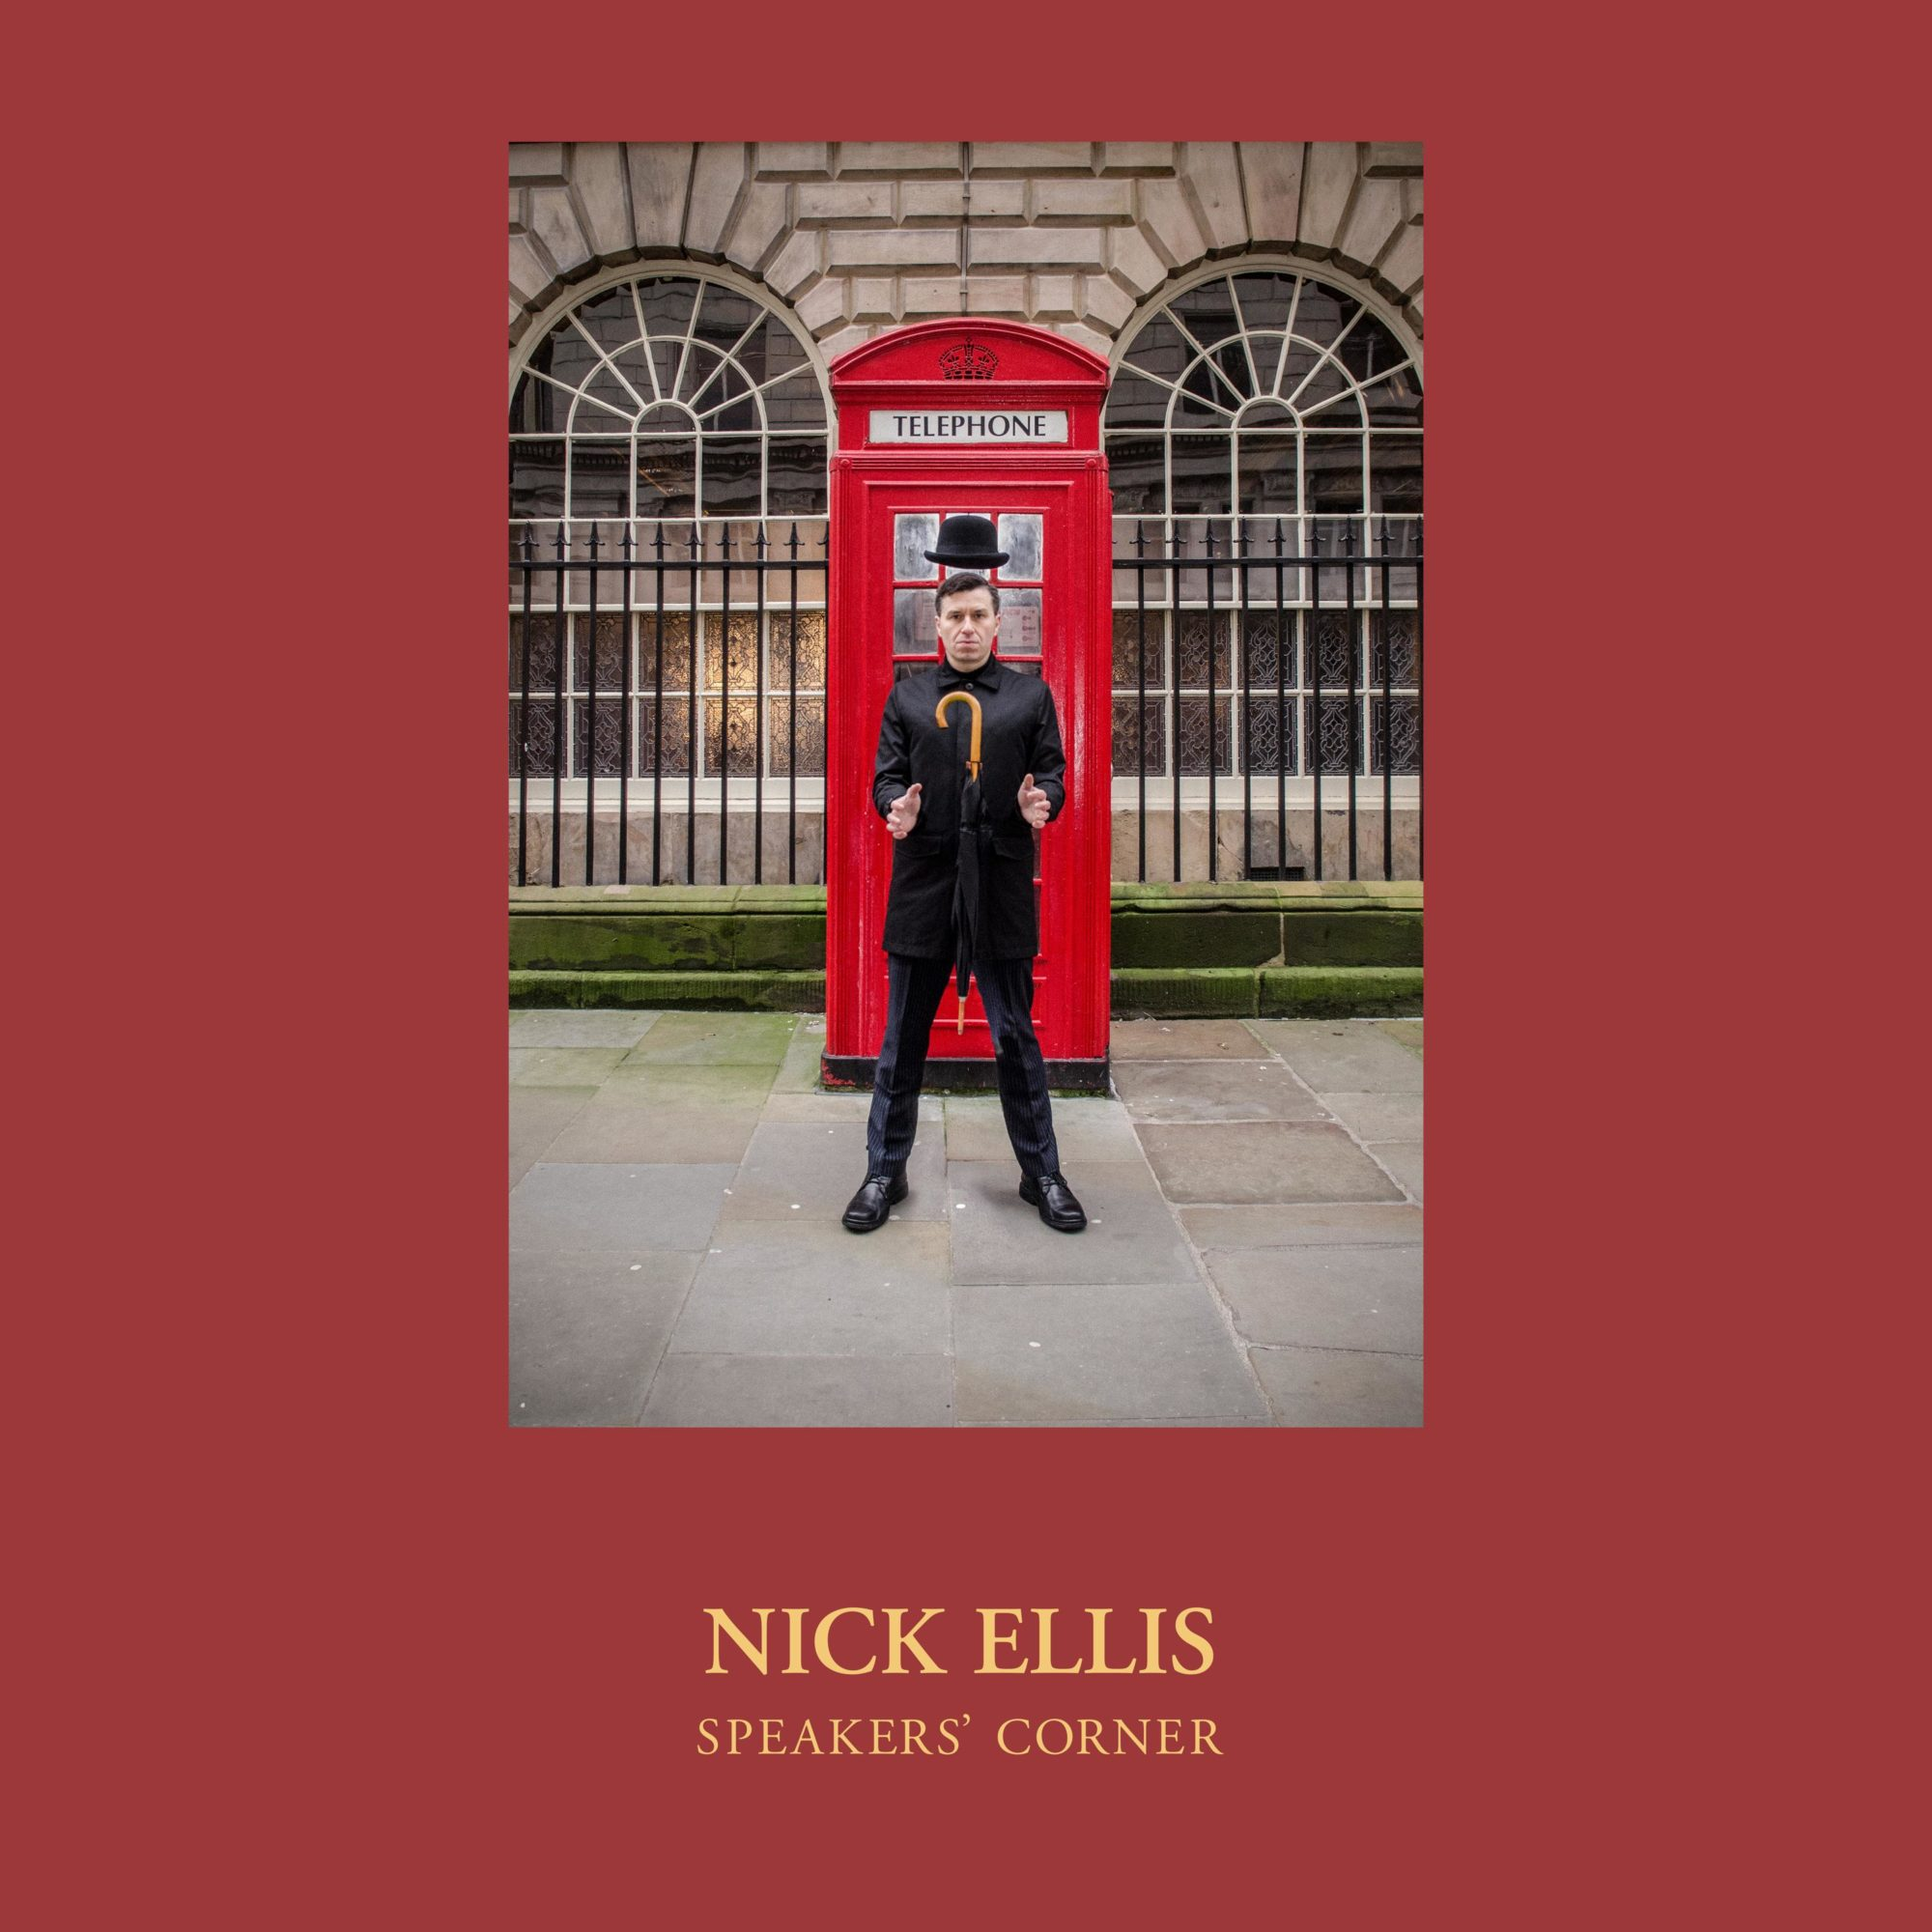 Nick Ellis - Speaker's Corner